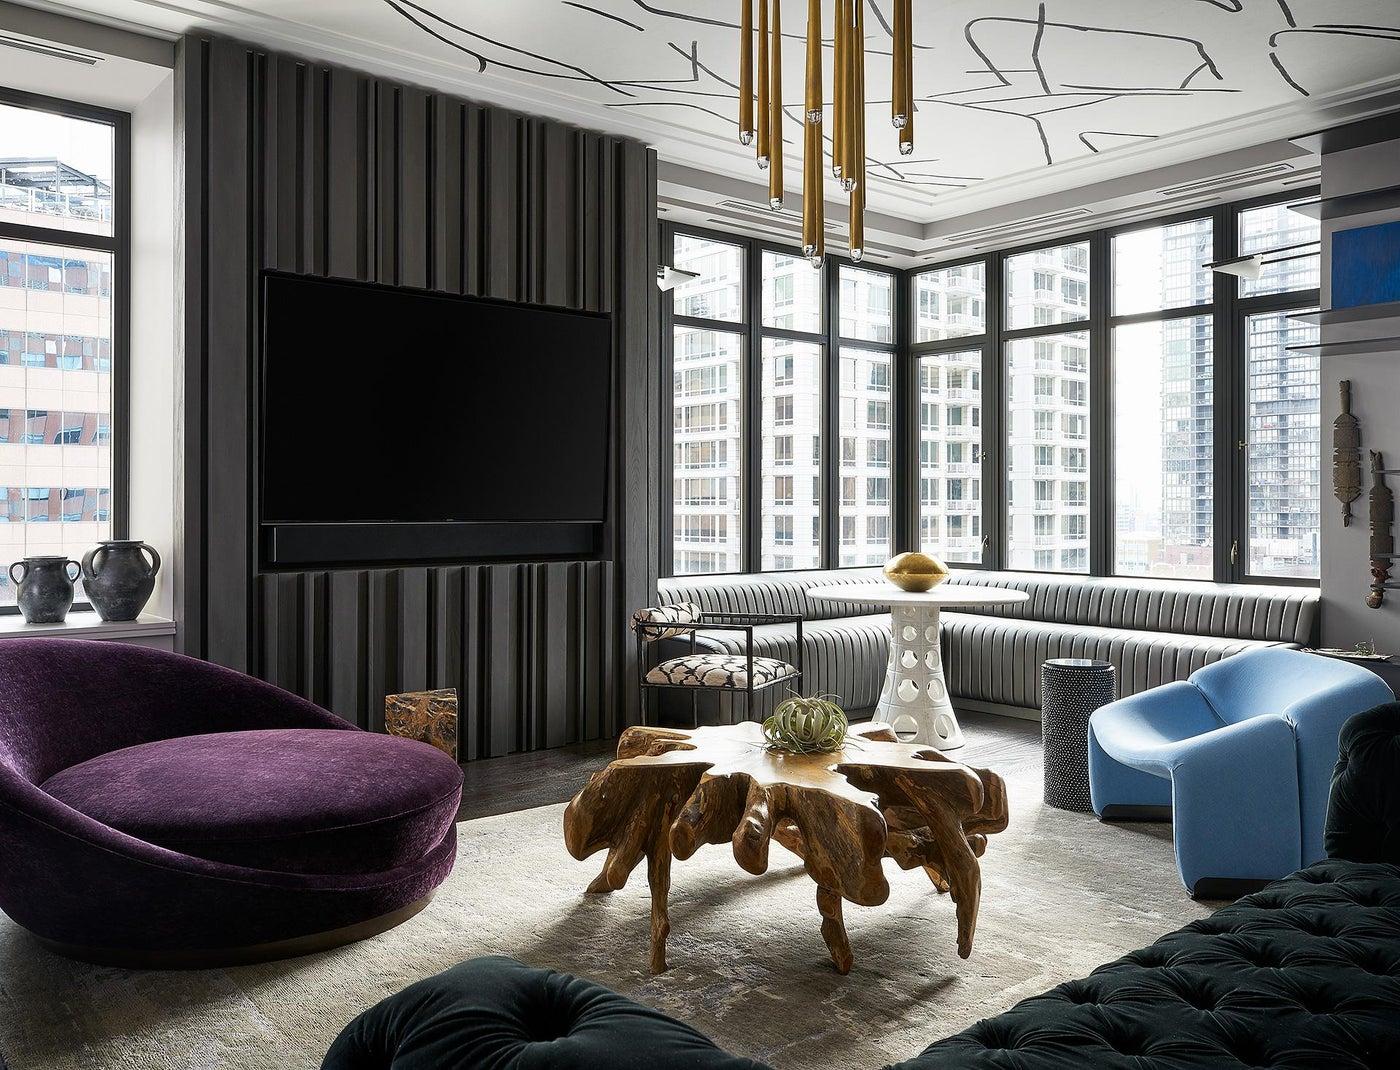 Ritz Carlton Residence, Bachelor Pad